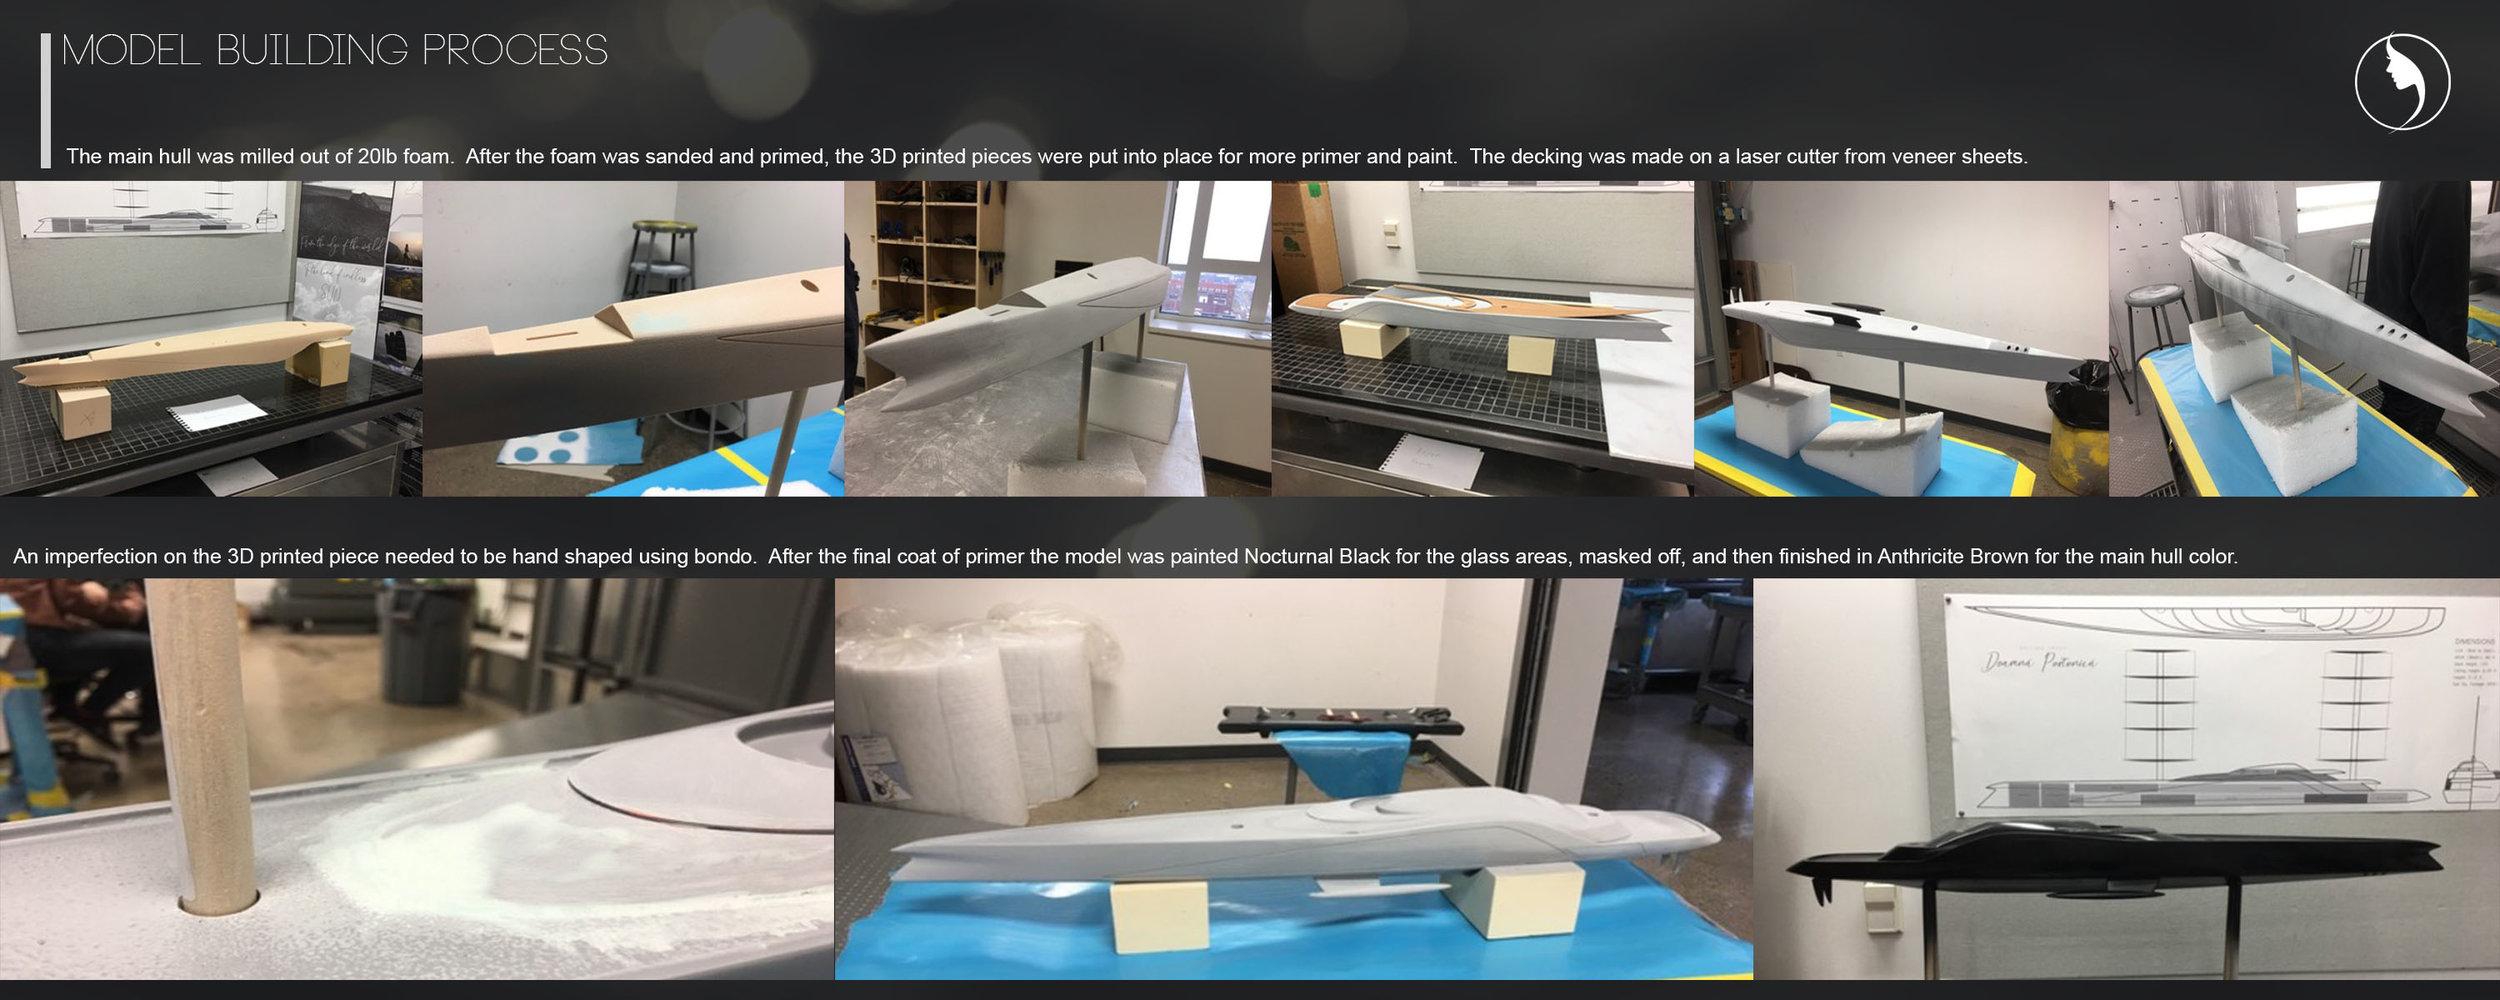 Oceanco Process.jpg